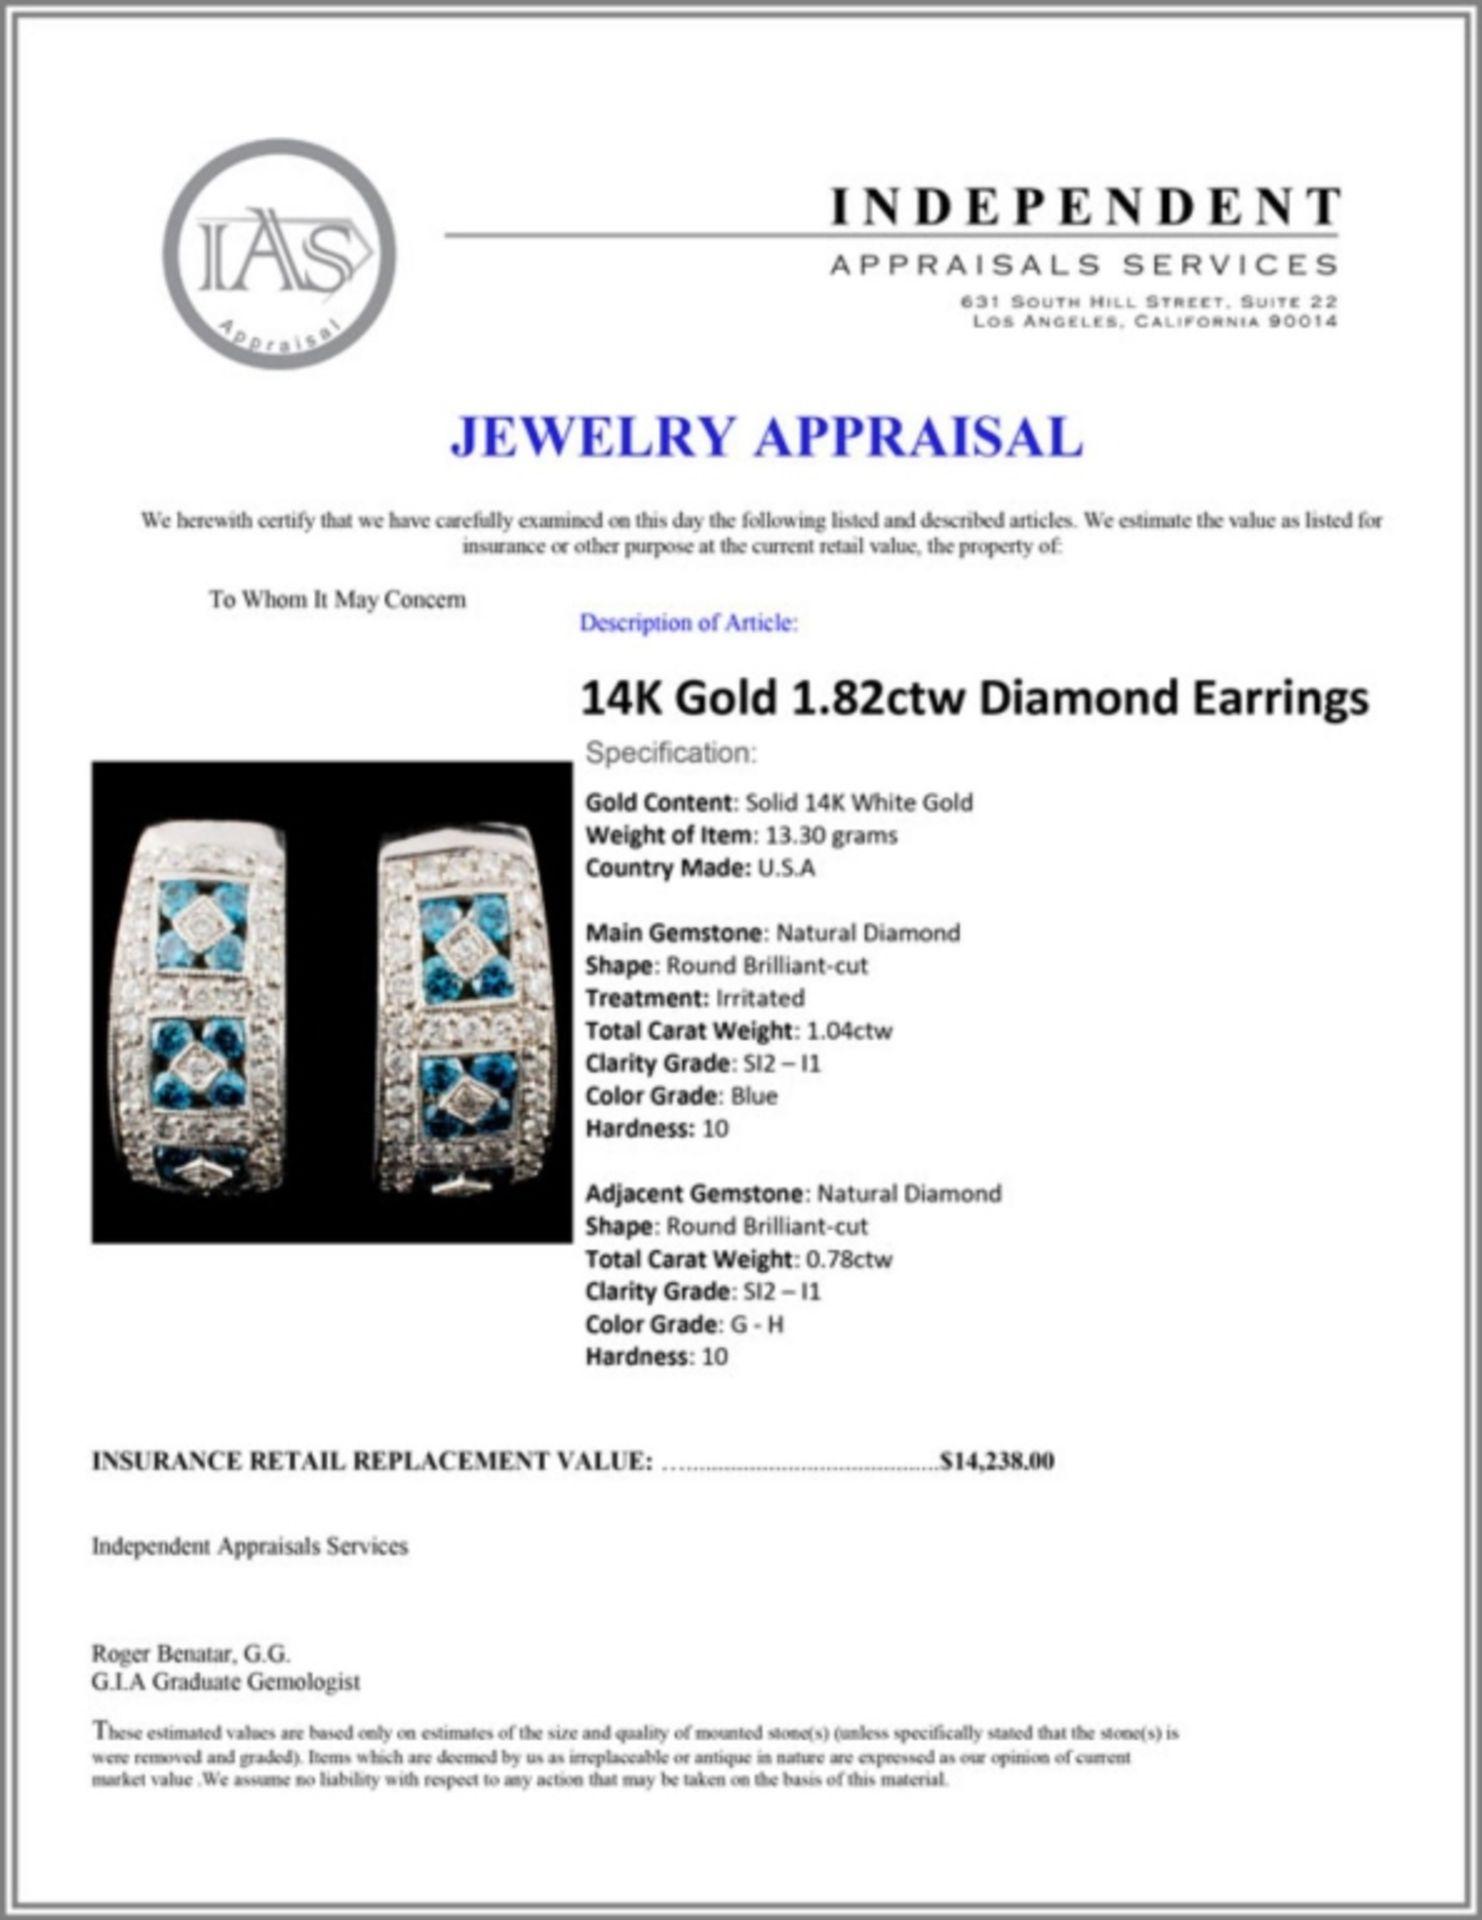 14K Gold 1.82ctw Diamond Earrings - Image 3 of 3